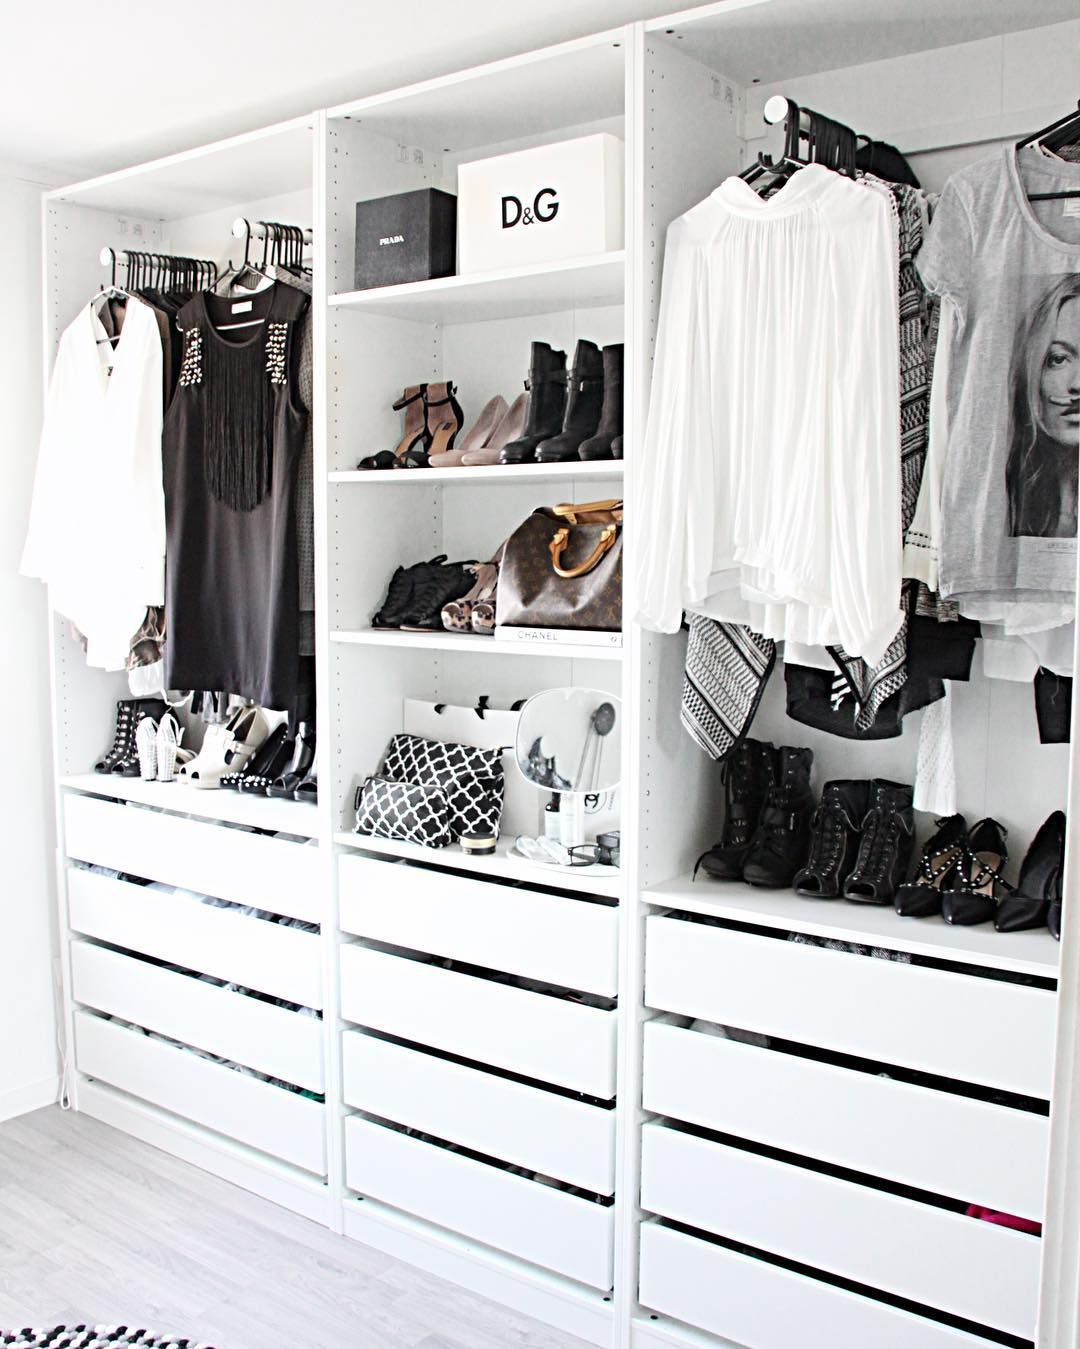 White Contemporary Open Closet Wardrobe Instagram Photo By Fregnate Closet Decor Modern Closet Designs Modern Closet